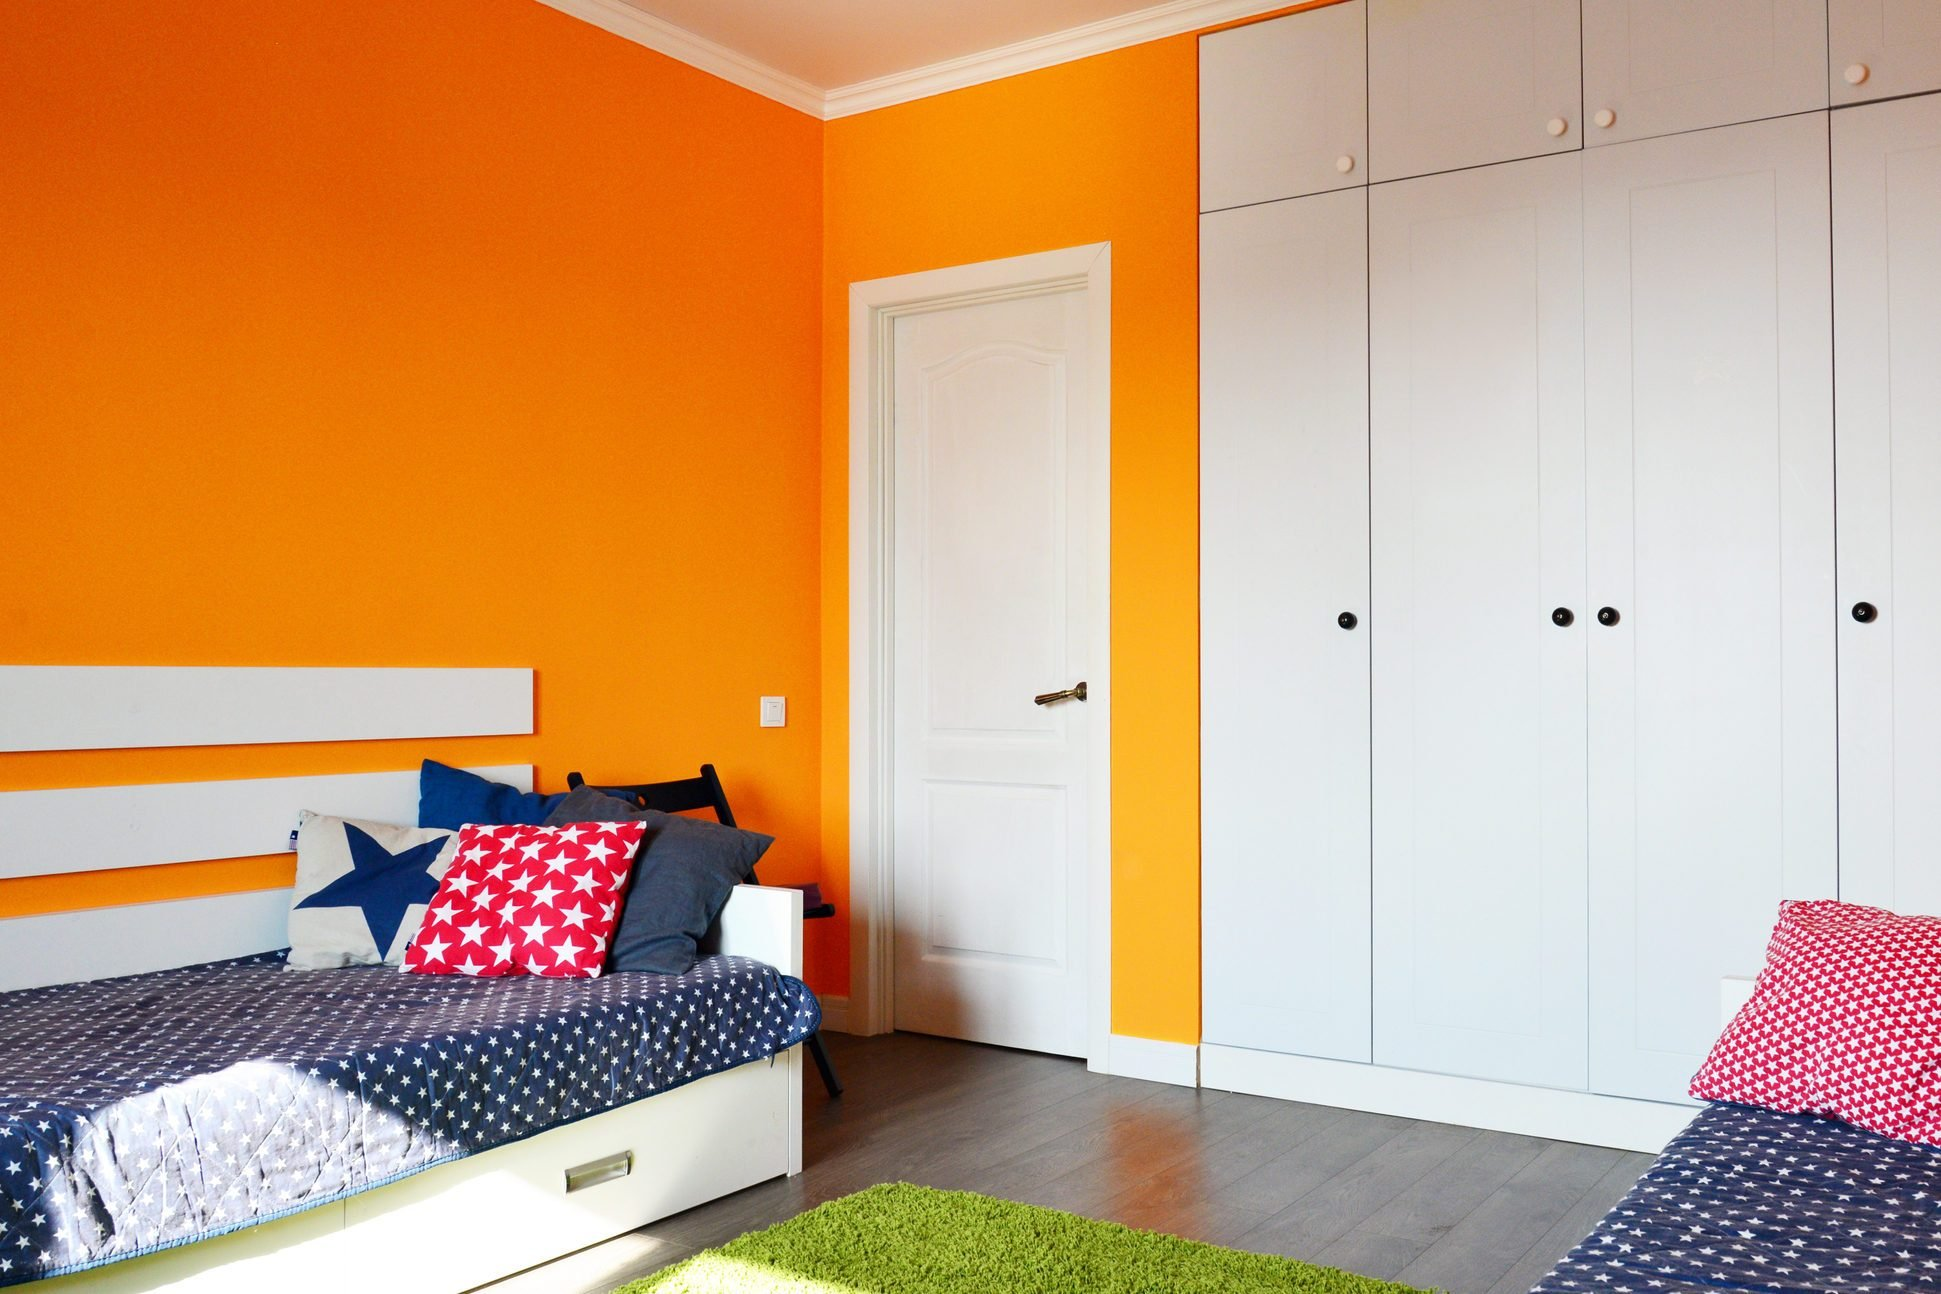 Kids bedroom in orange and blue colors